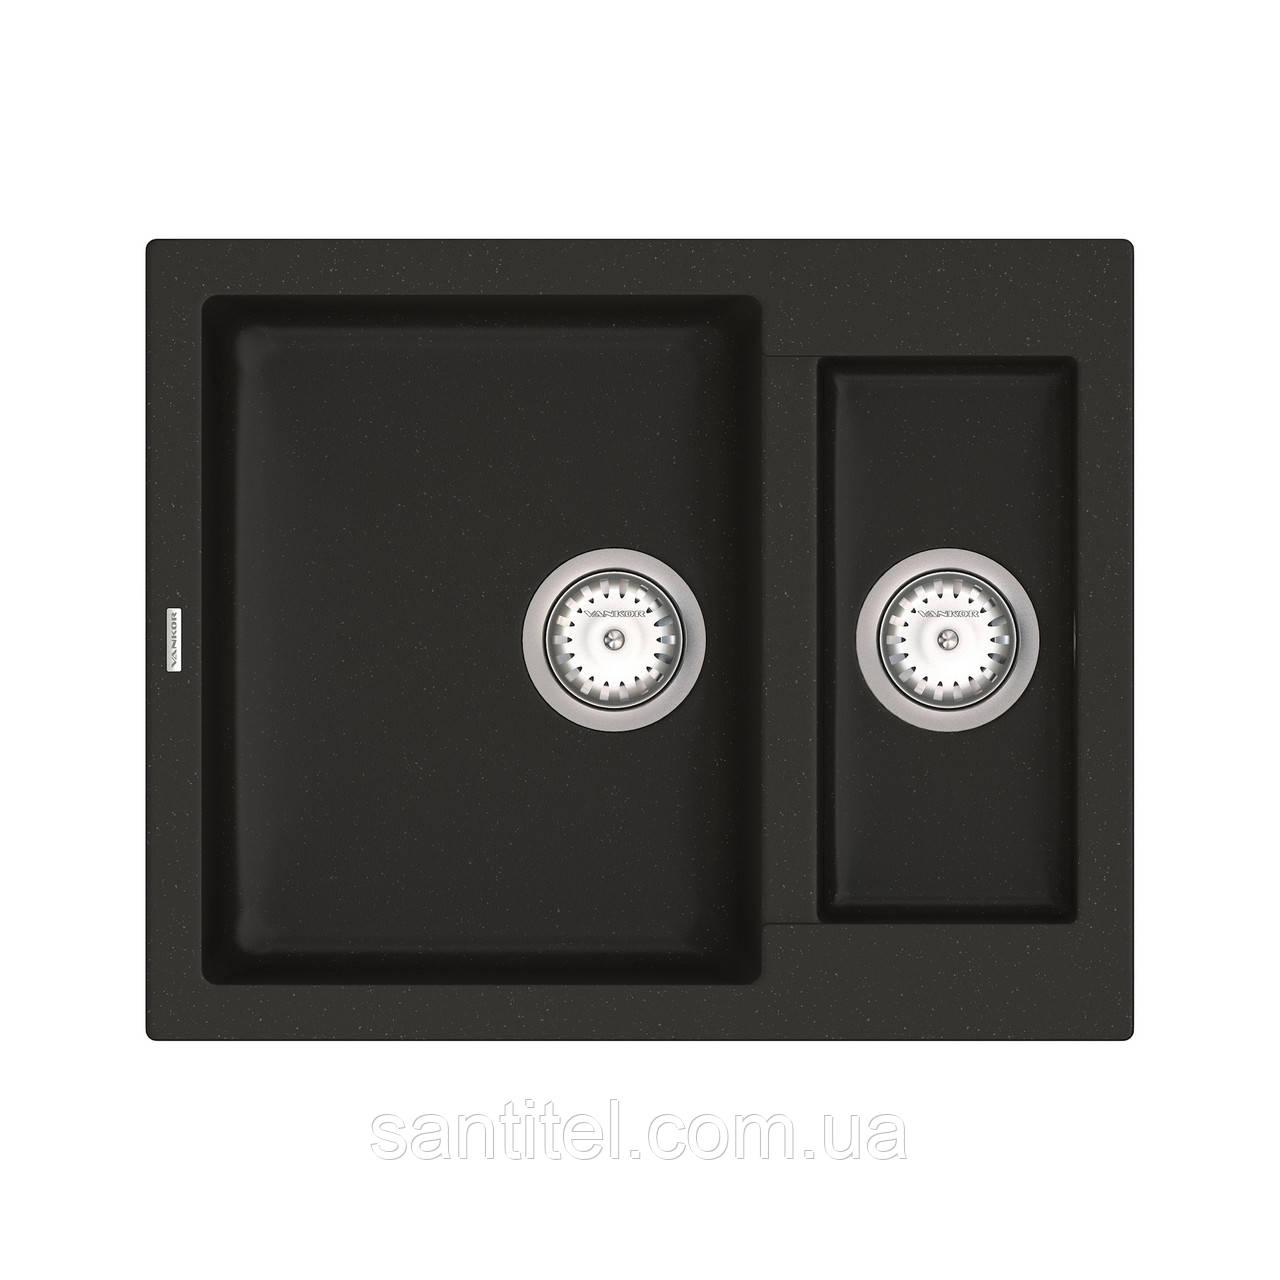 Кухонная мойка VANKOR Orman OMP 03.61 Black + сифон VANKOR